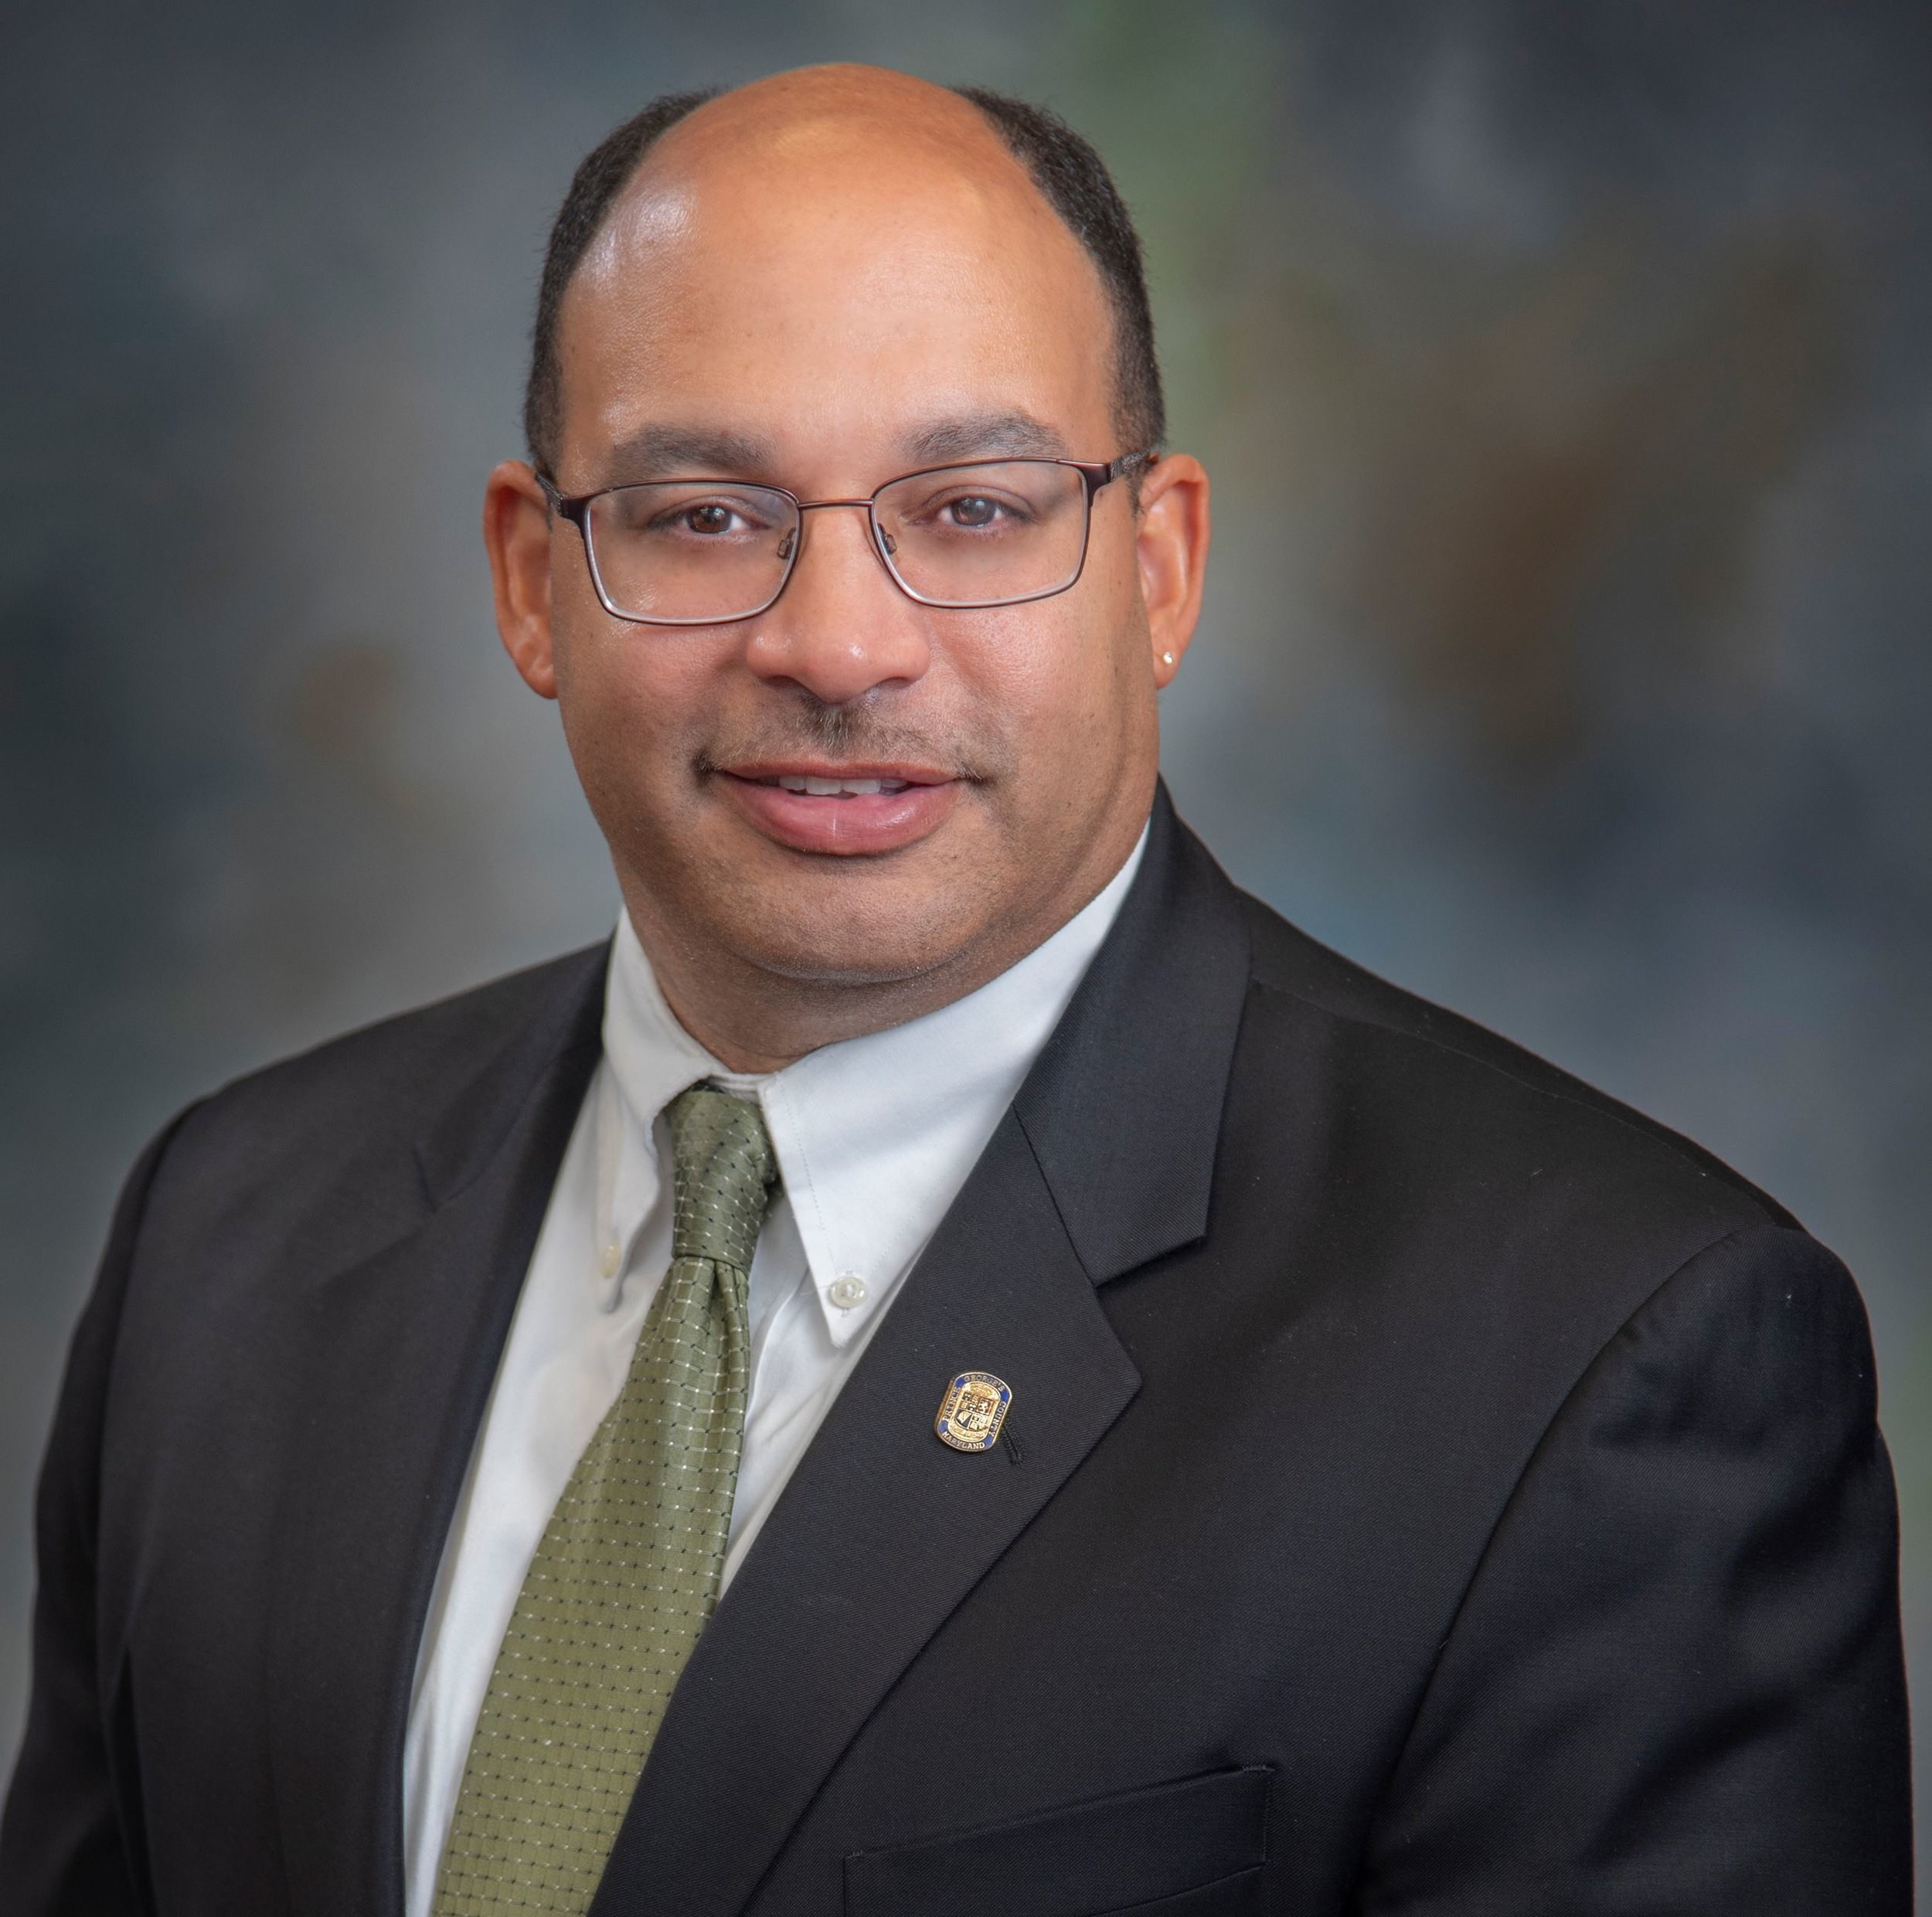 Councilman Todd Turner